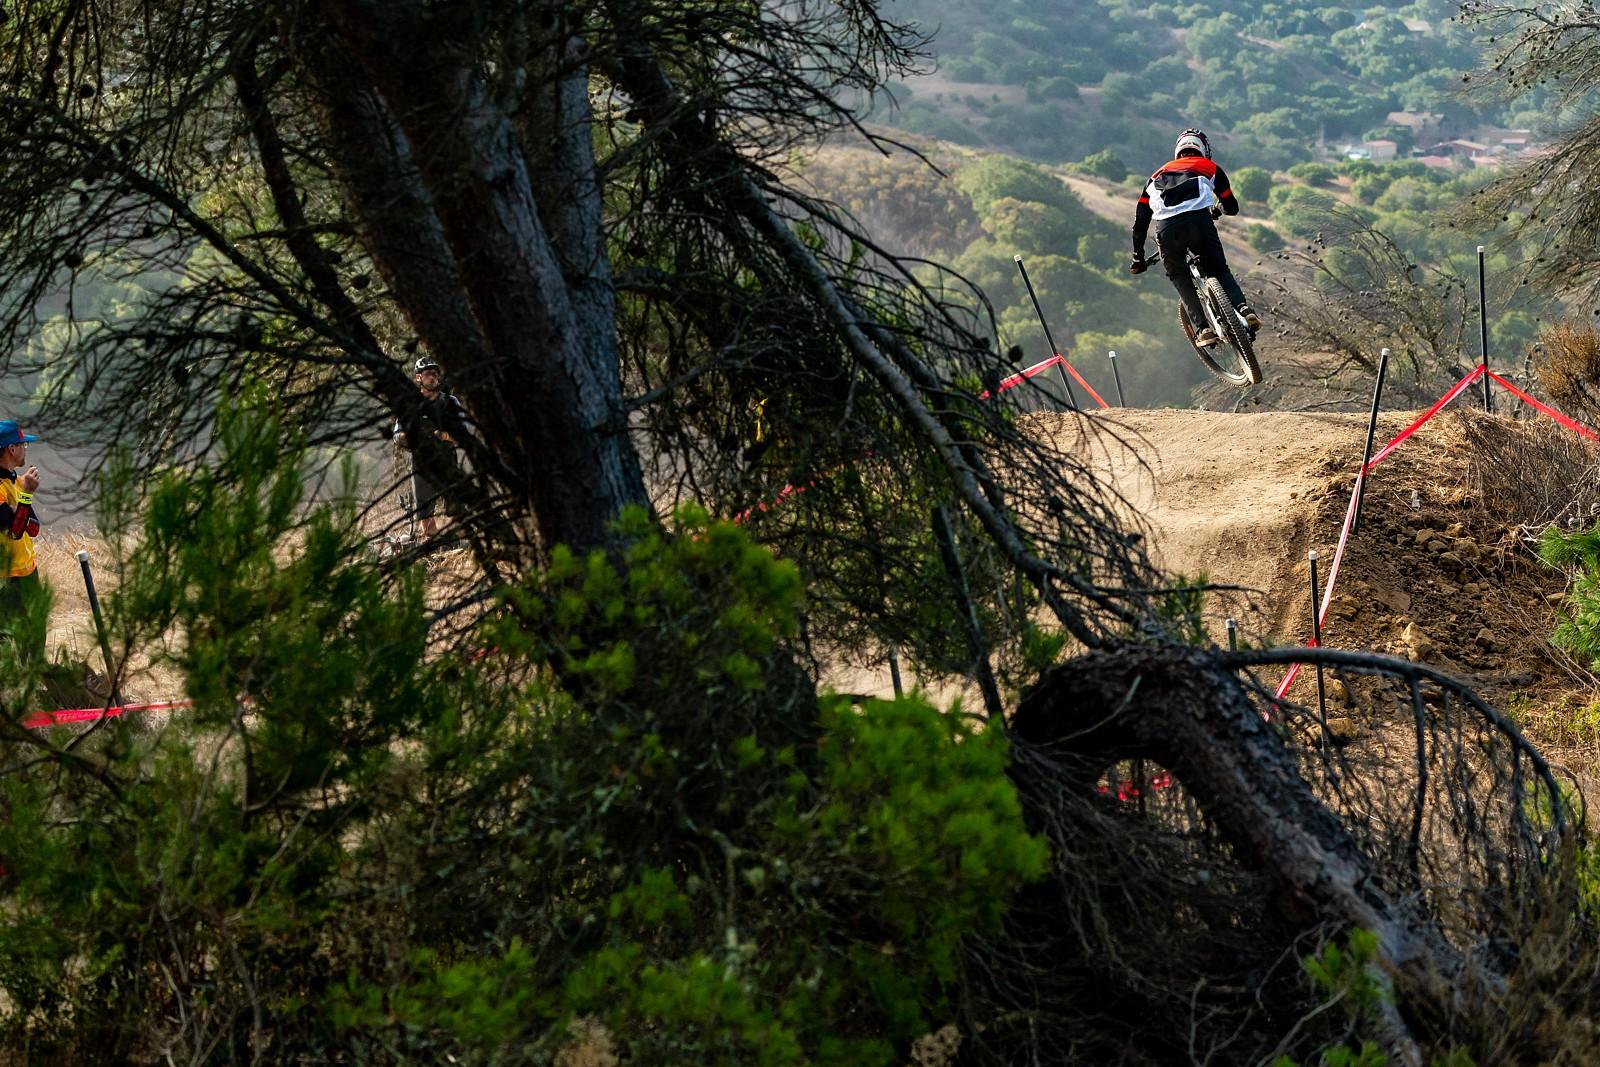 Tyler Maples - Zuestman - Mountain Biking Pictures - Vital MTB